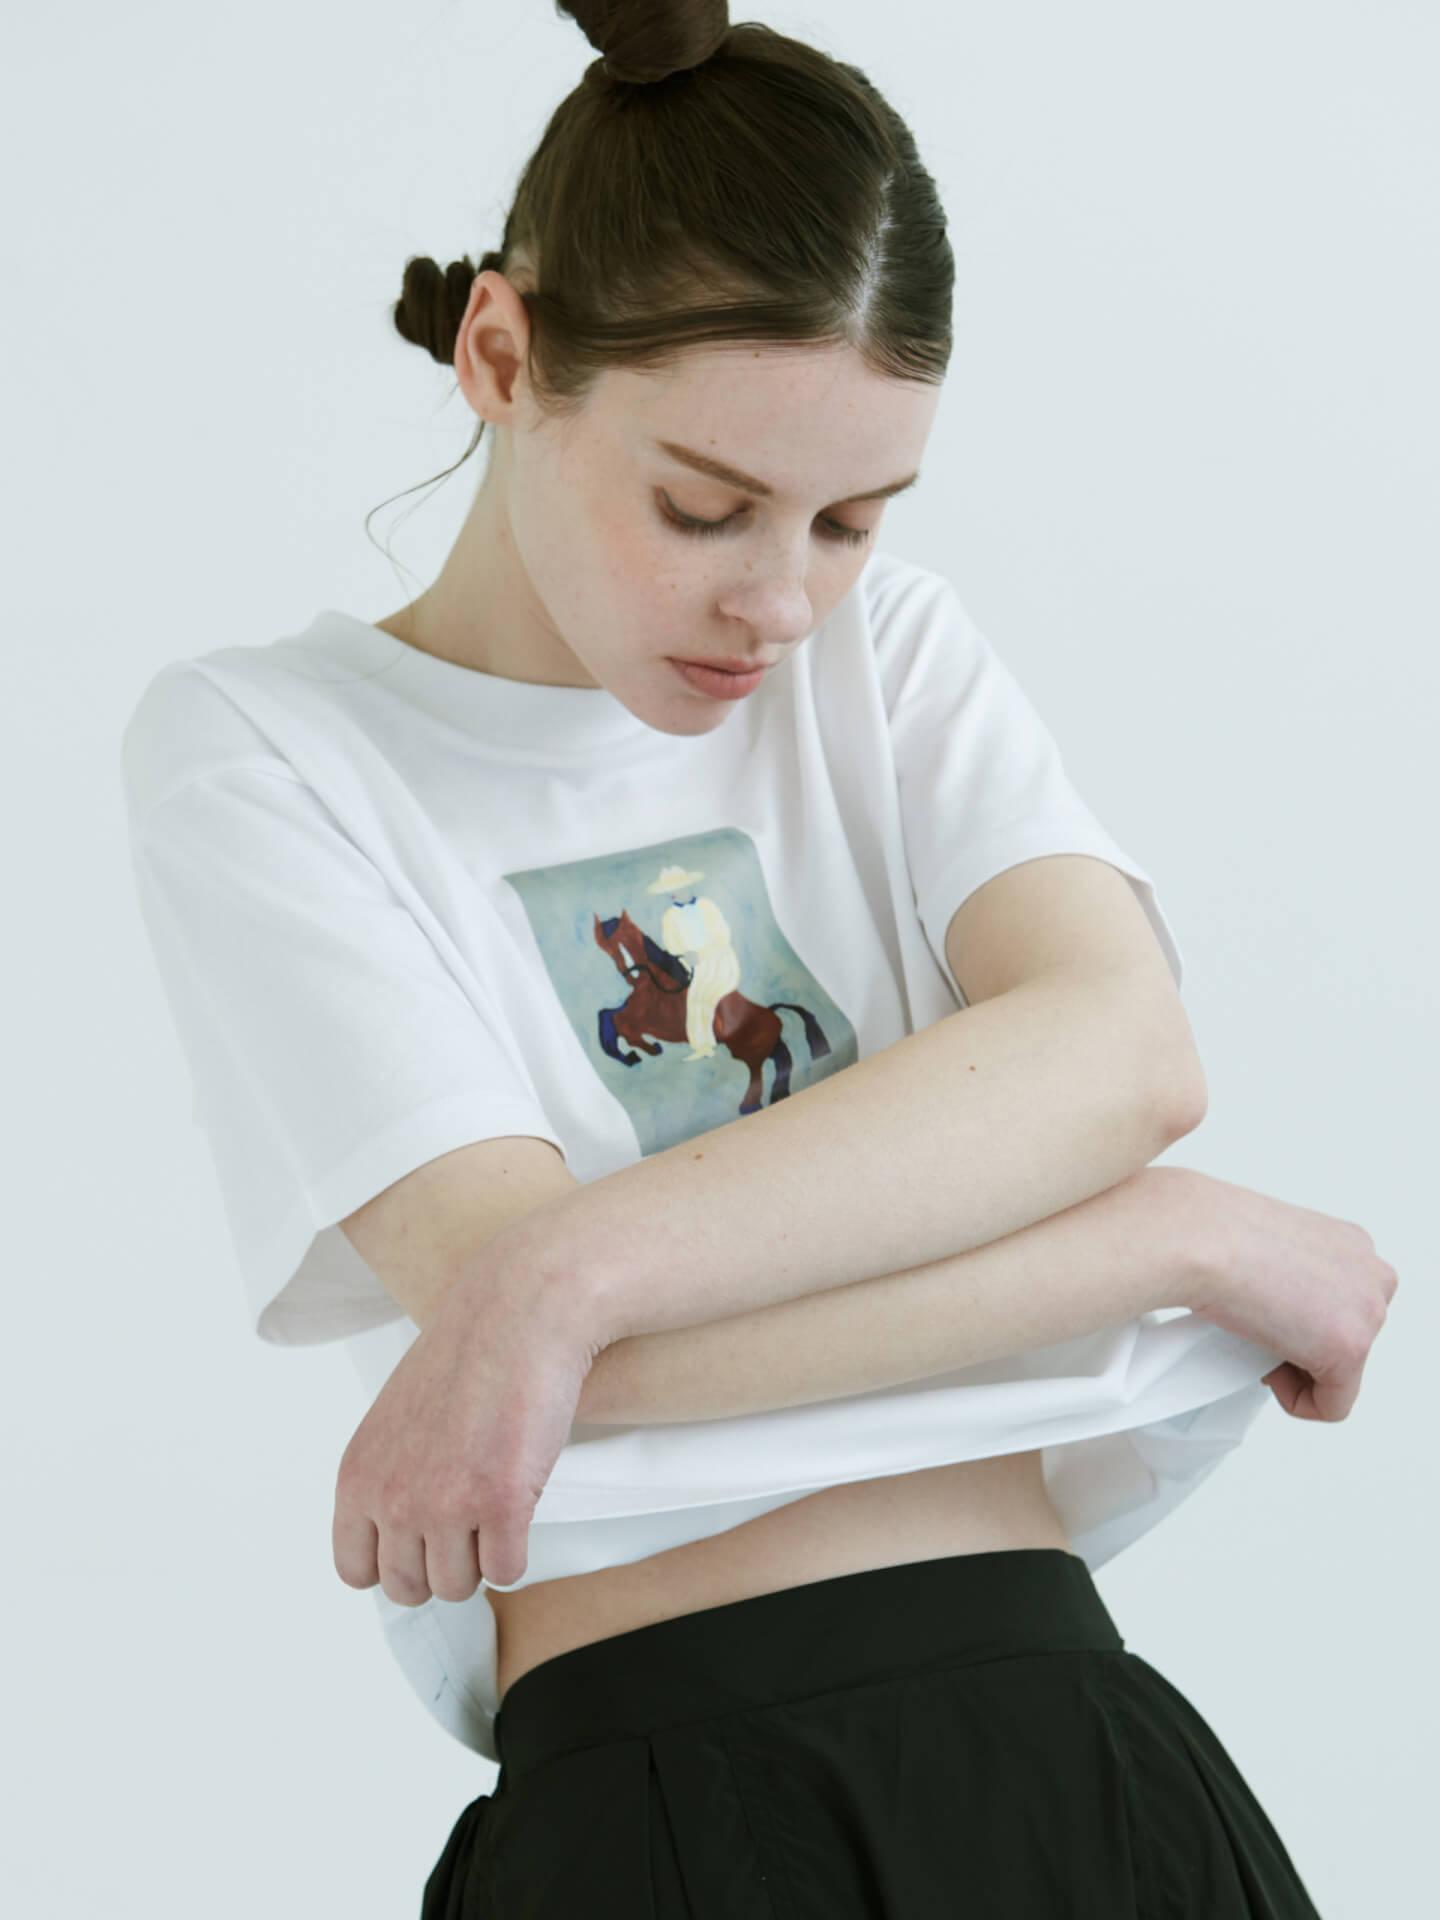 CHAIのベーシスト・YUUKIによるプロジェクト「YMYM」よりファッションブランドオープン!2021年春夏コレクション&描き下ろし絵画などの展示会も life210405_ymym_7